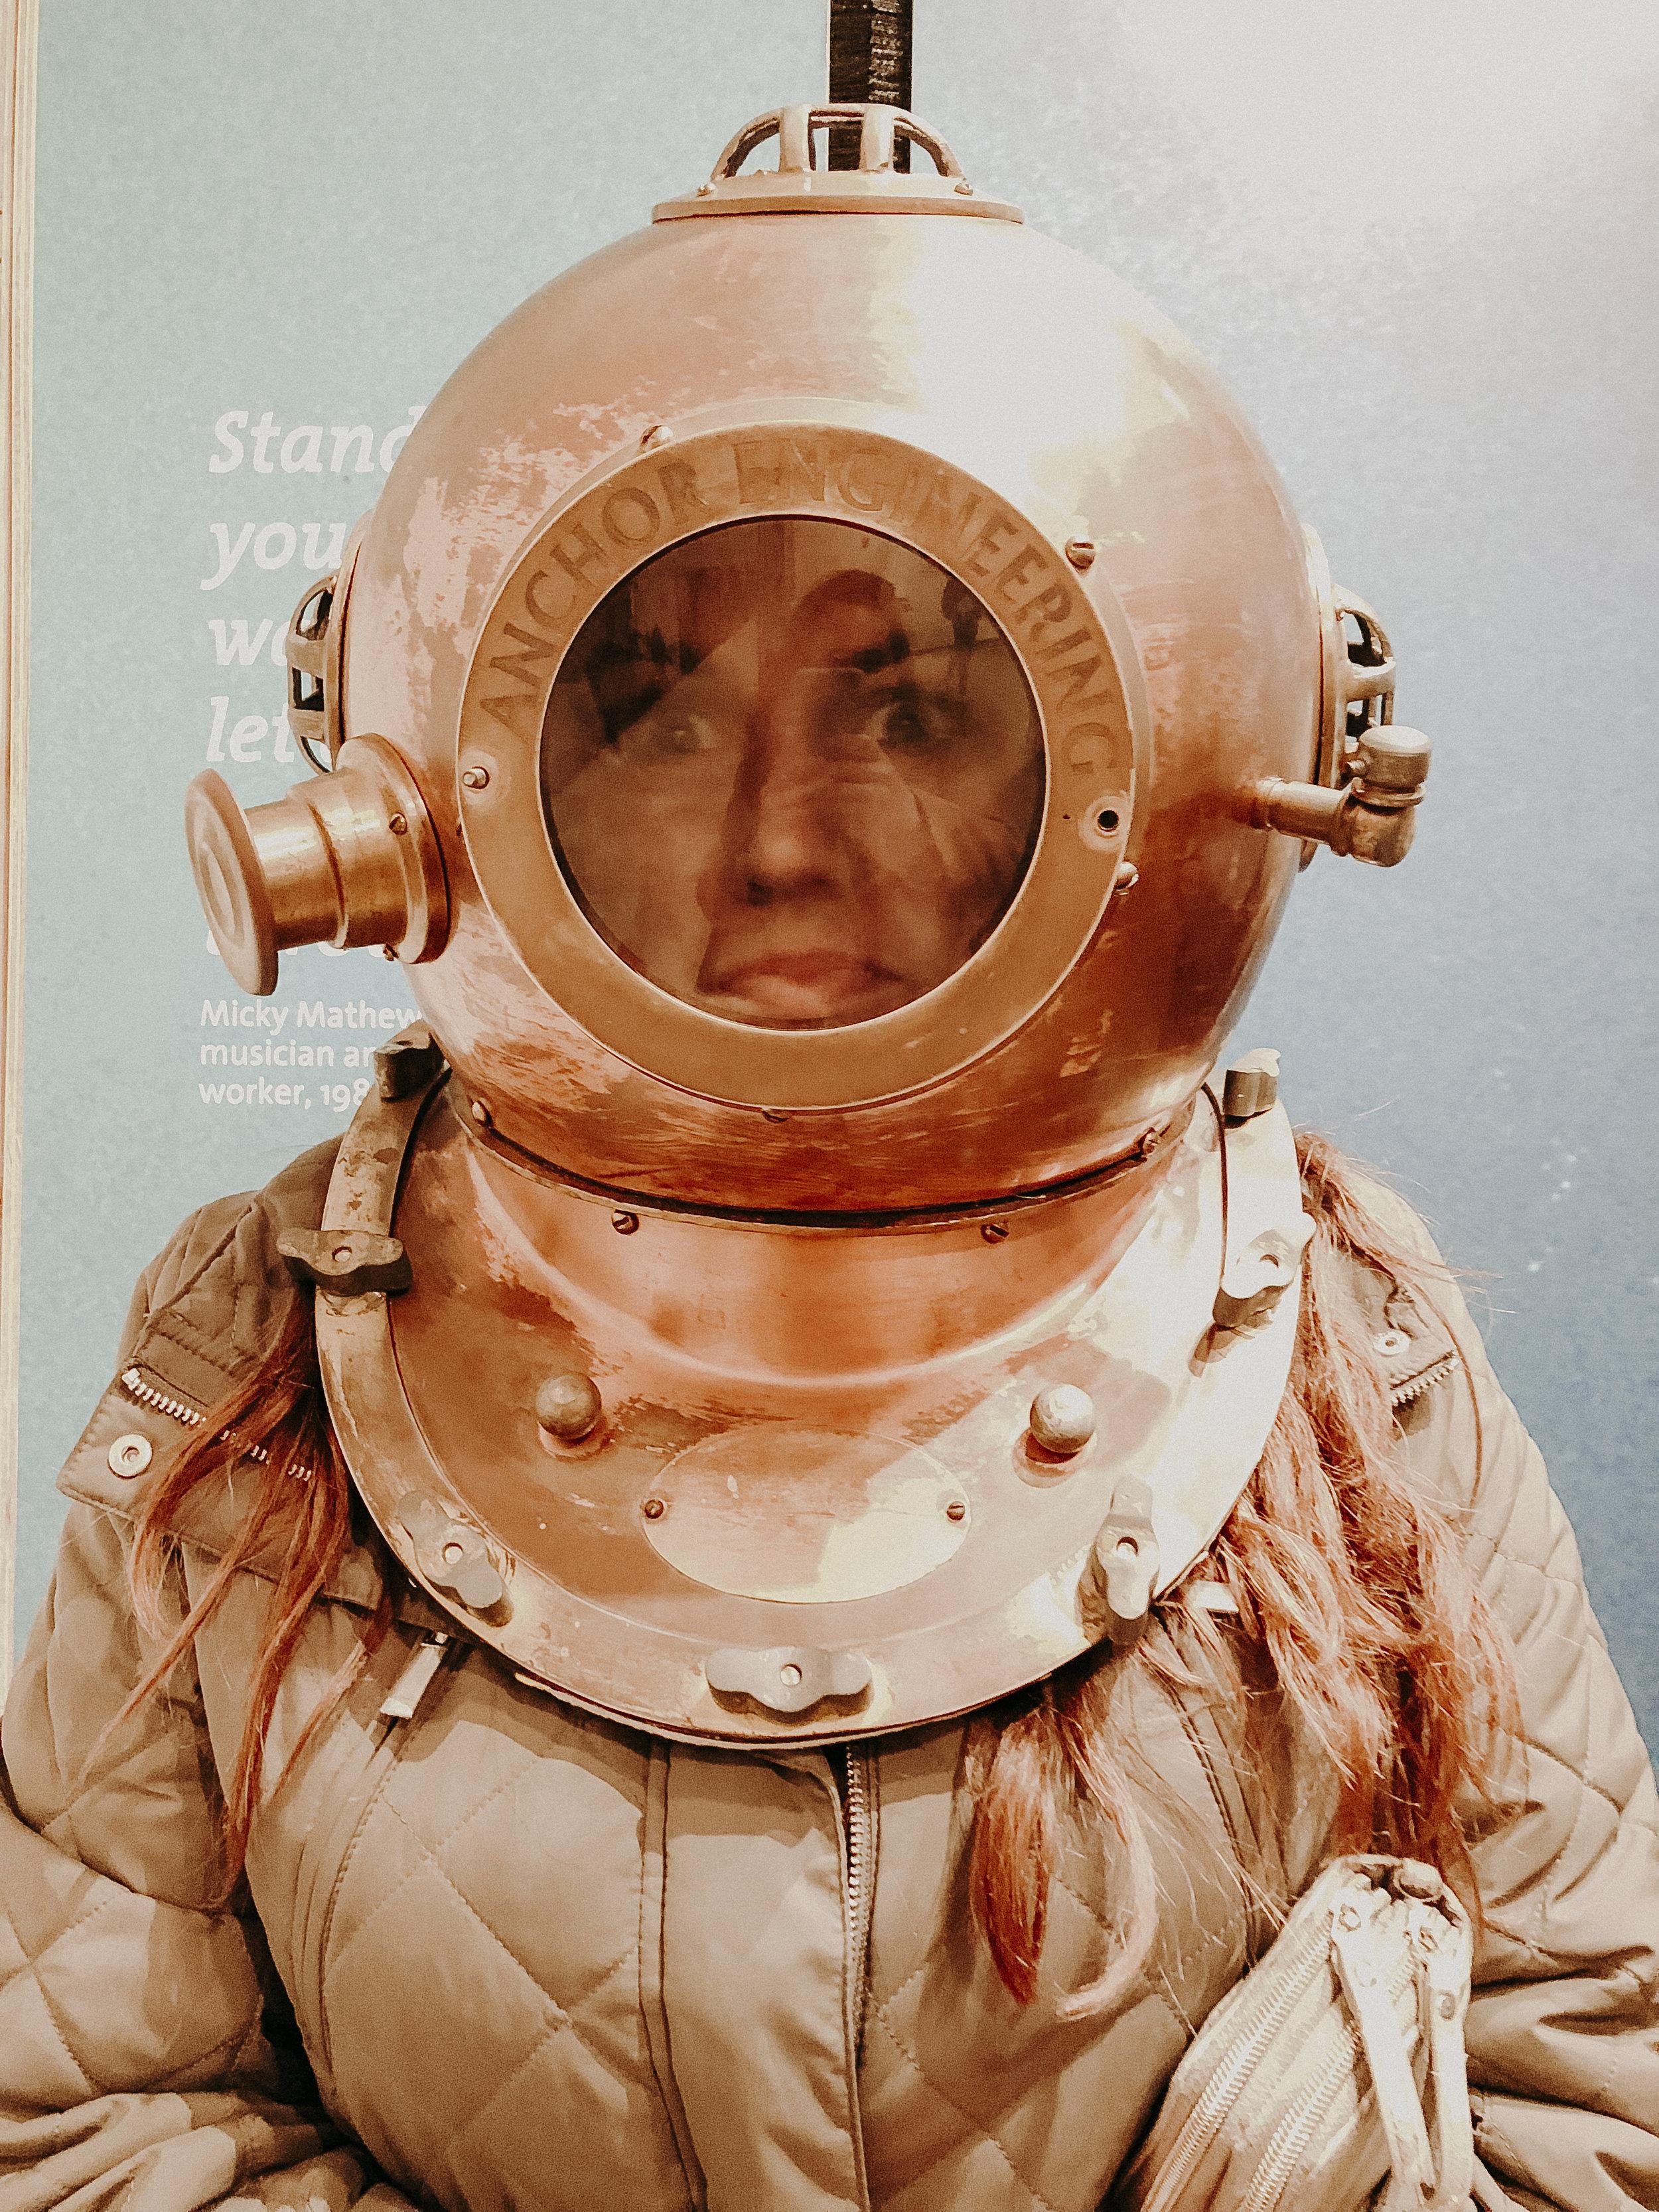 Christine enjoying the National Museum of Australia.